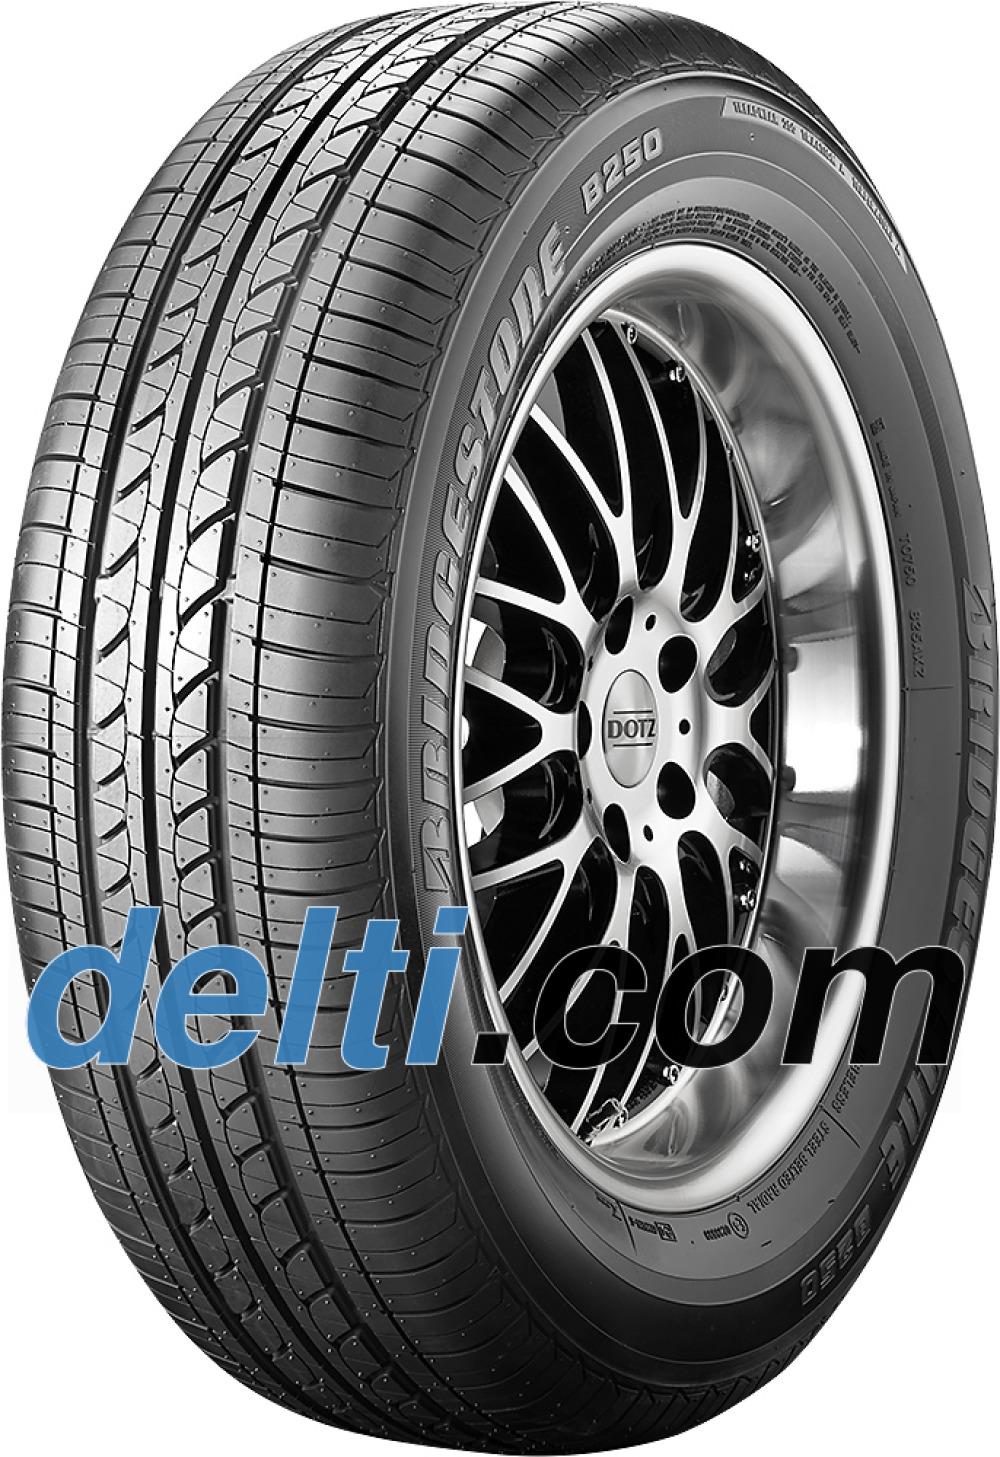 Bridgestone B 250 ( 155/65 R14 75T )